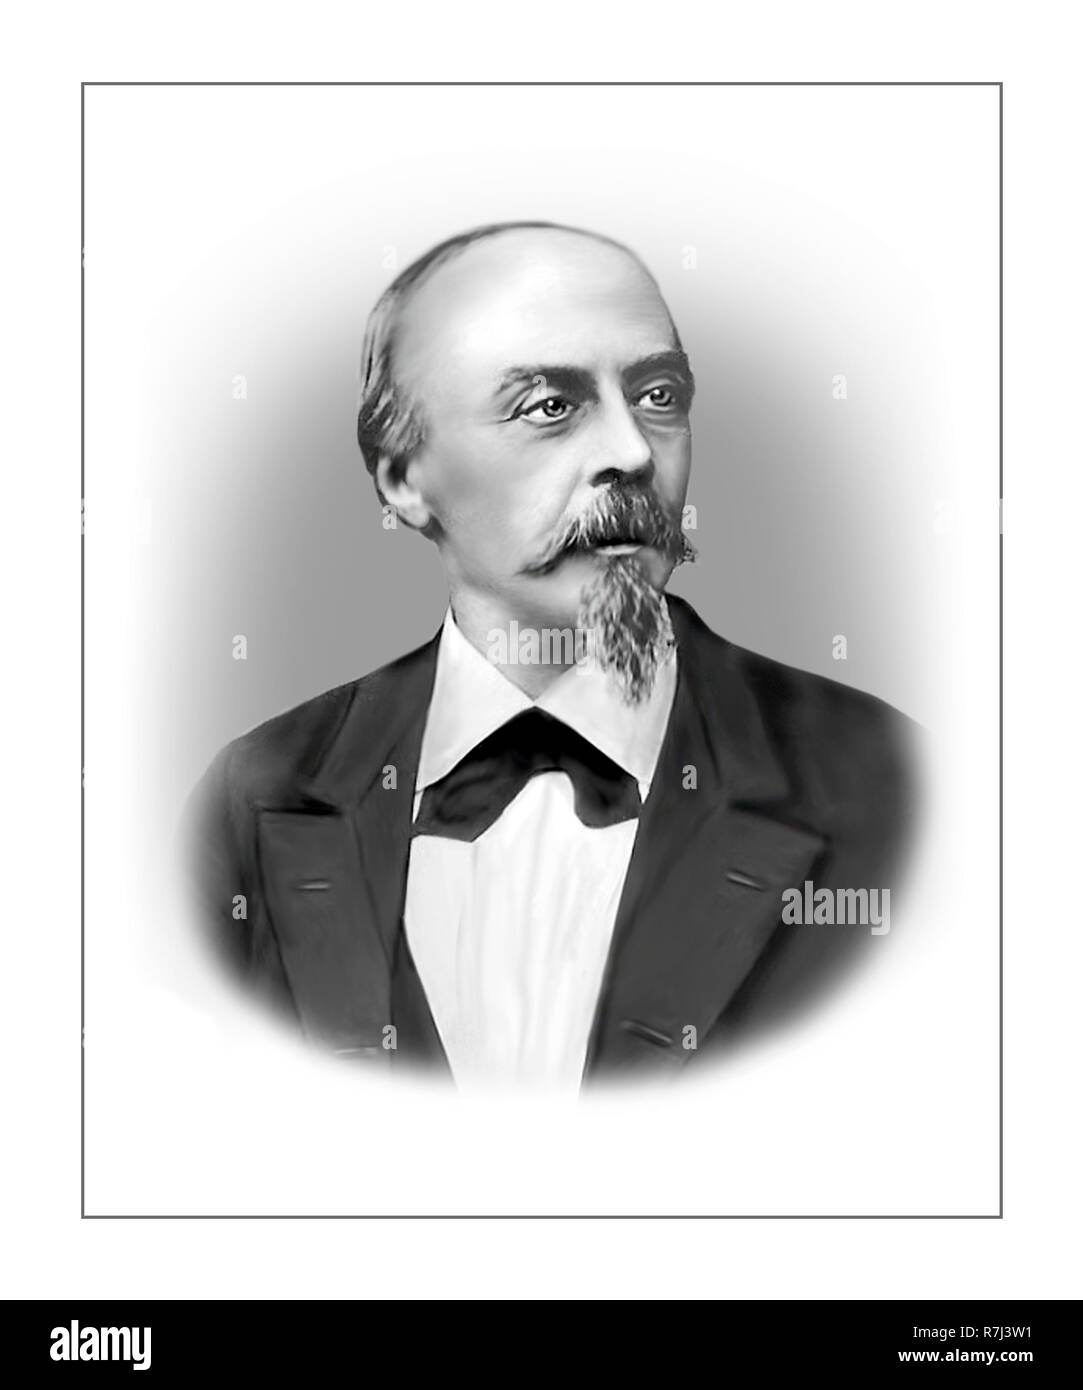 Hans von Bulow  1830 - 1894  German Conductor Composer Pianist - Stock Image